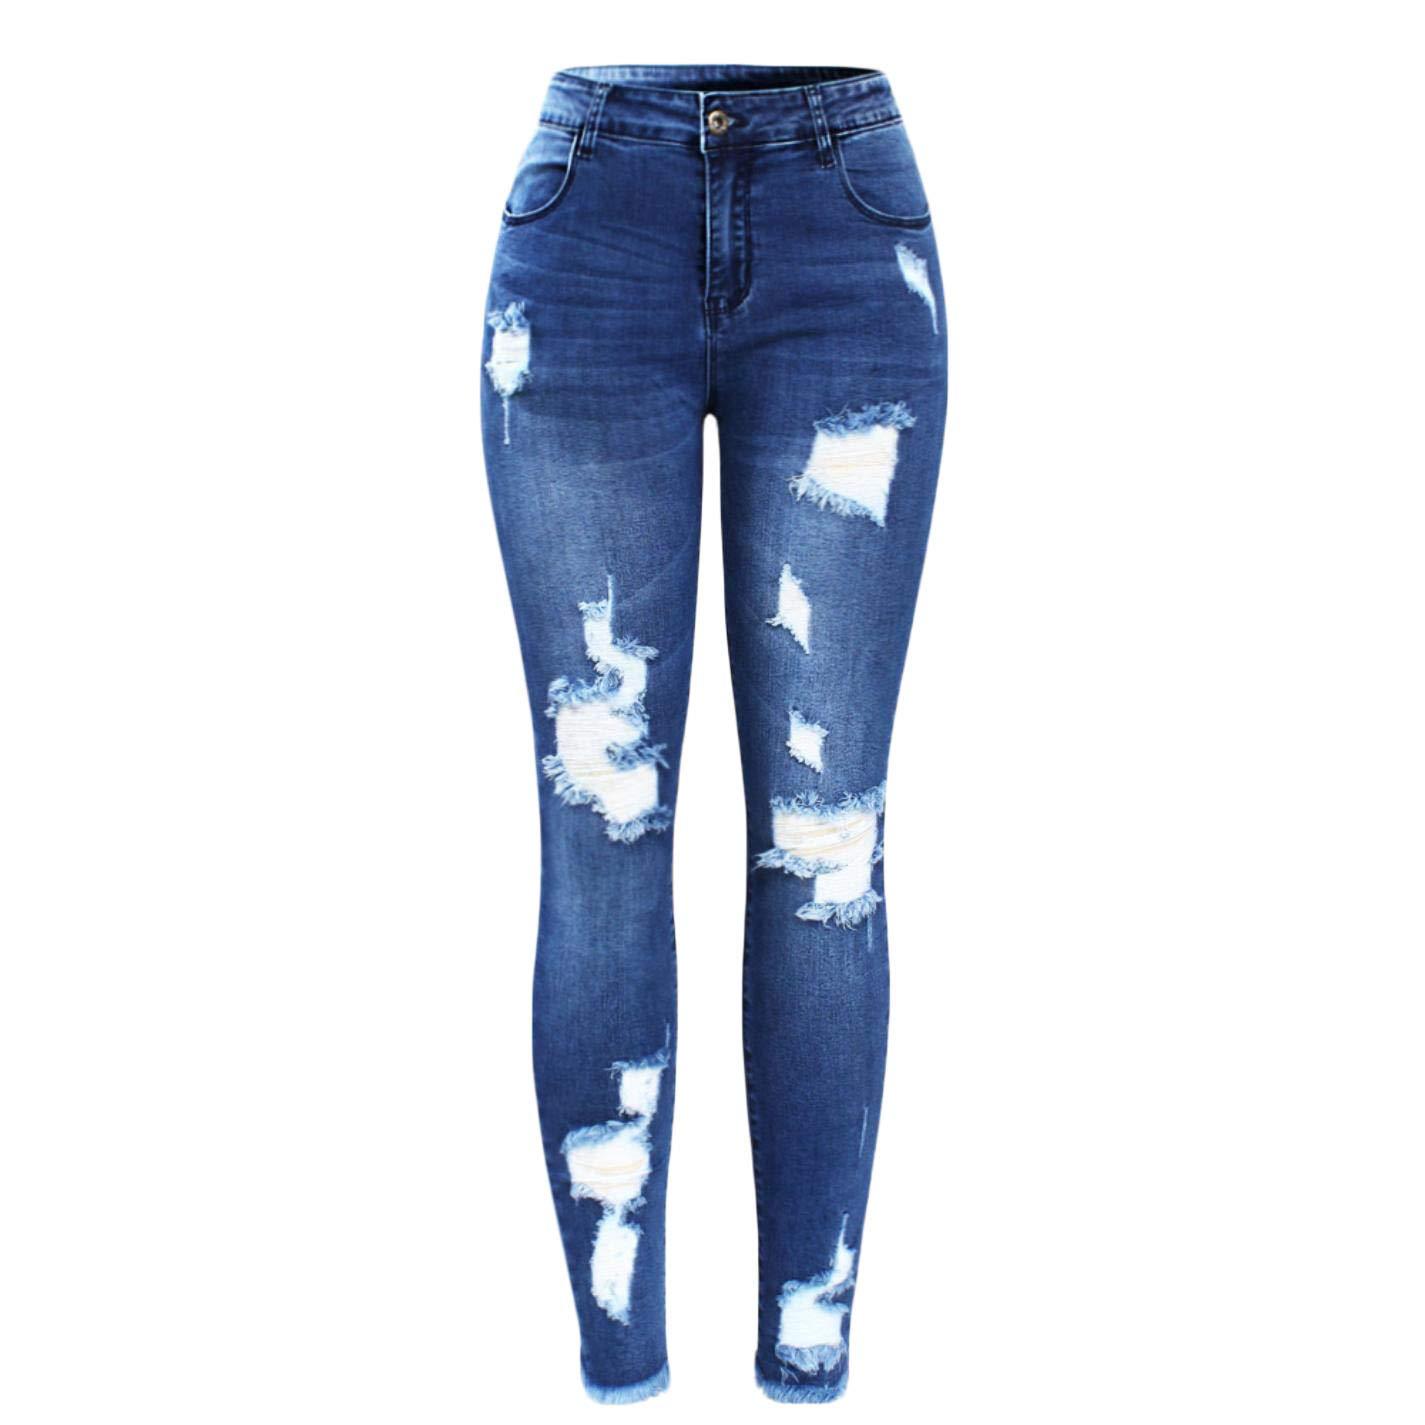 TiGcTRly Women Fashion Ultra Stretchy Blue Tassel Ripped Skinny Jeans